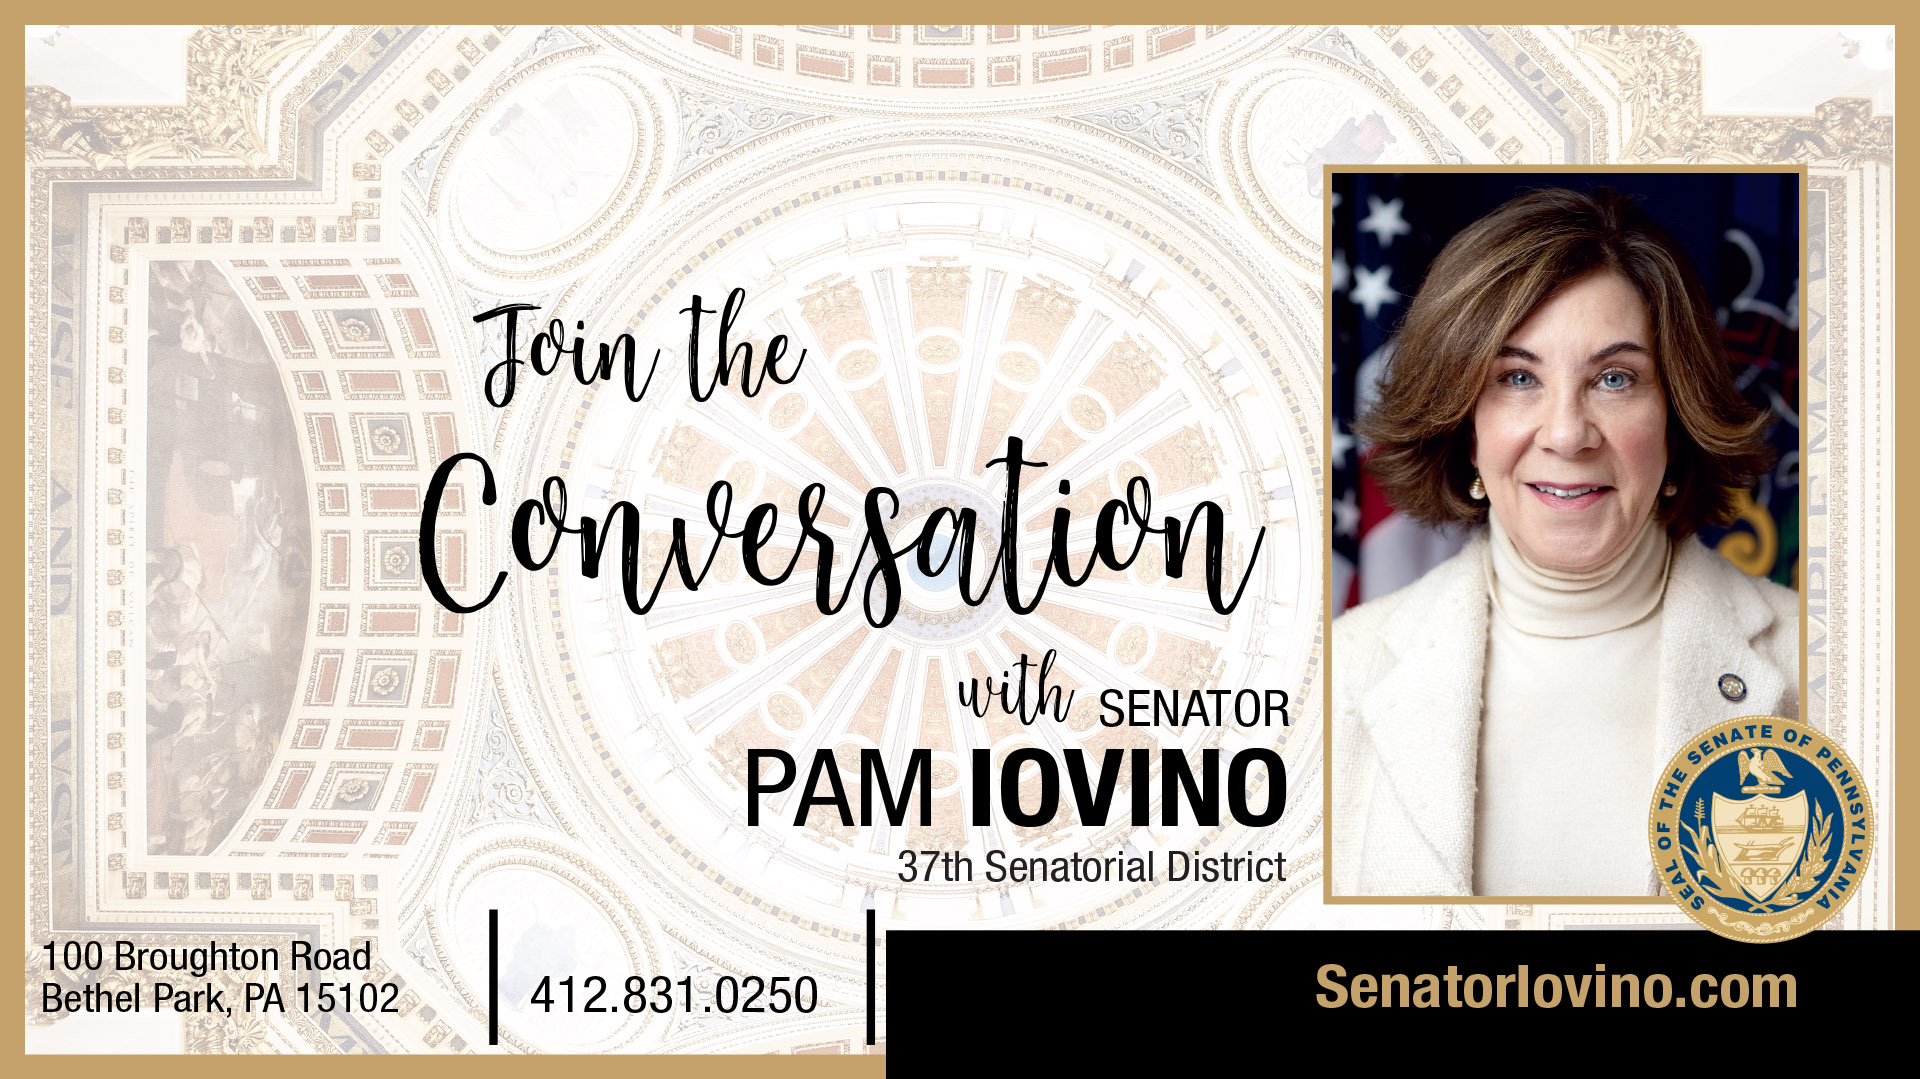 PA State Senator Pam Iovino